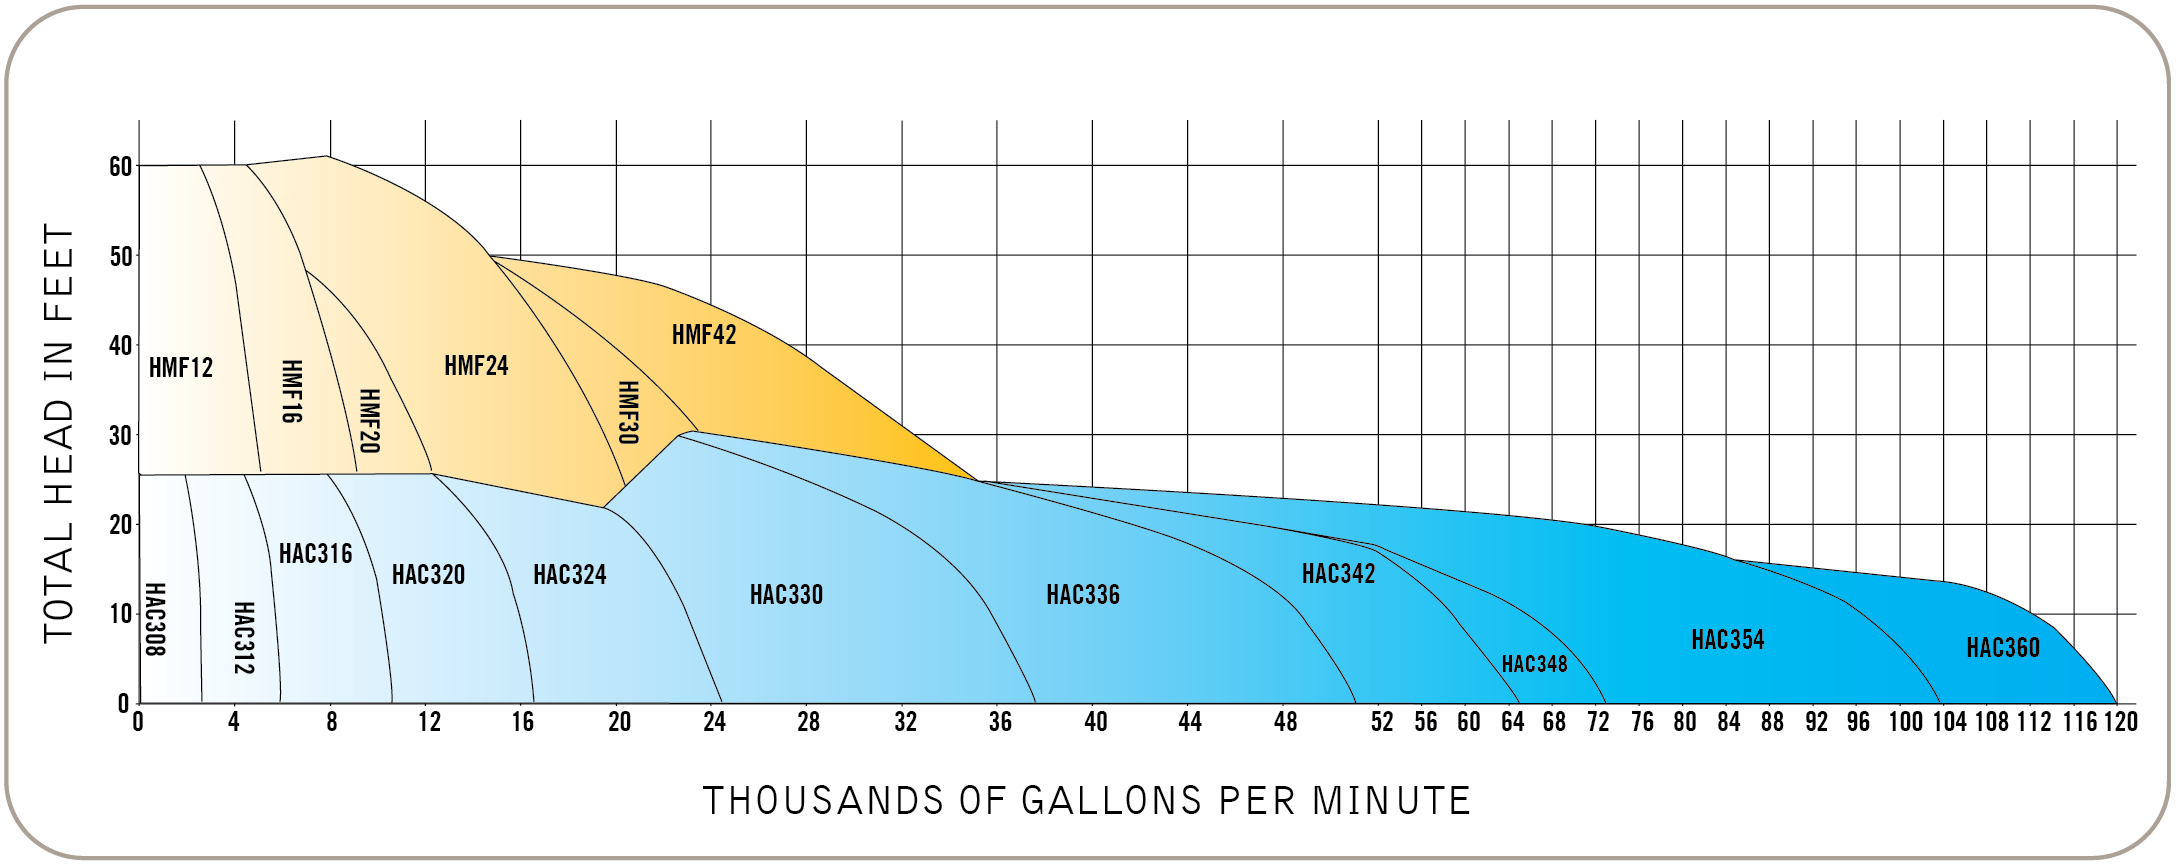 HYDRAFLO™ performance curve